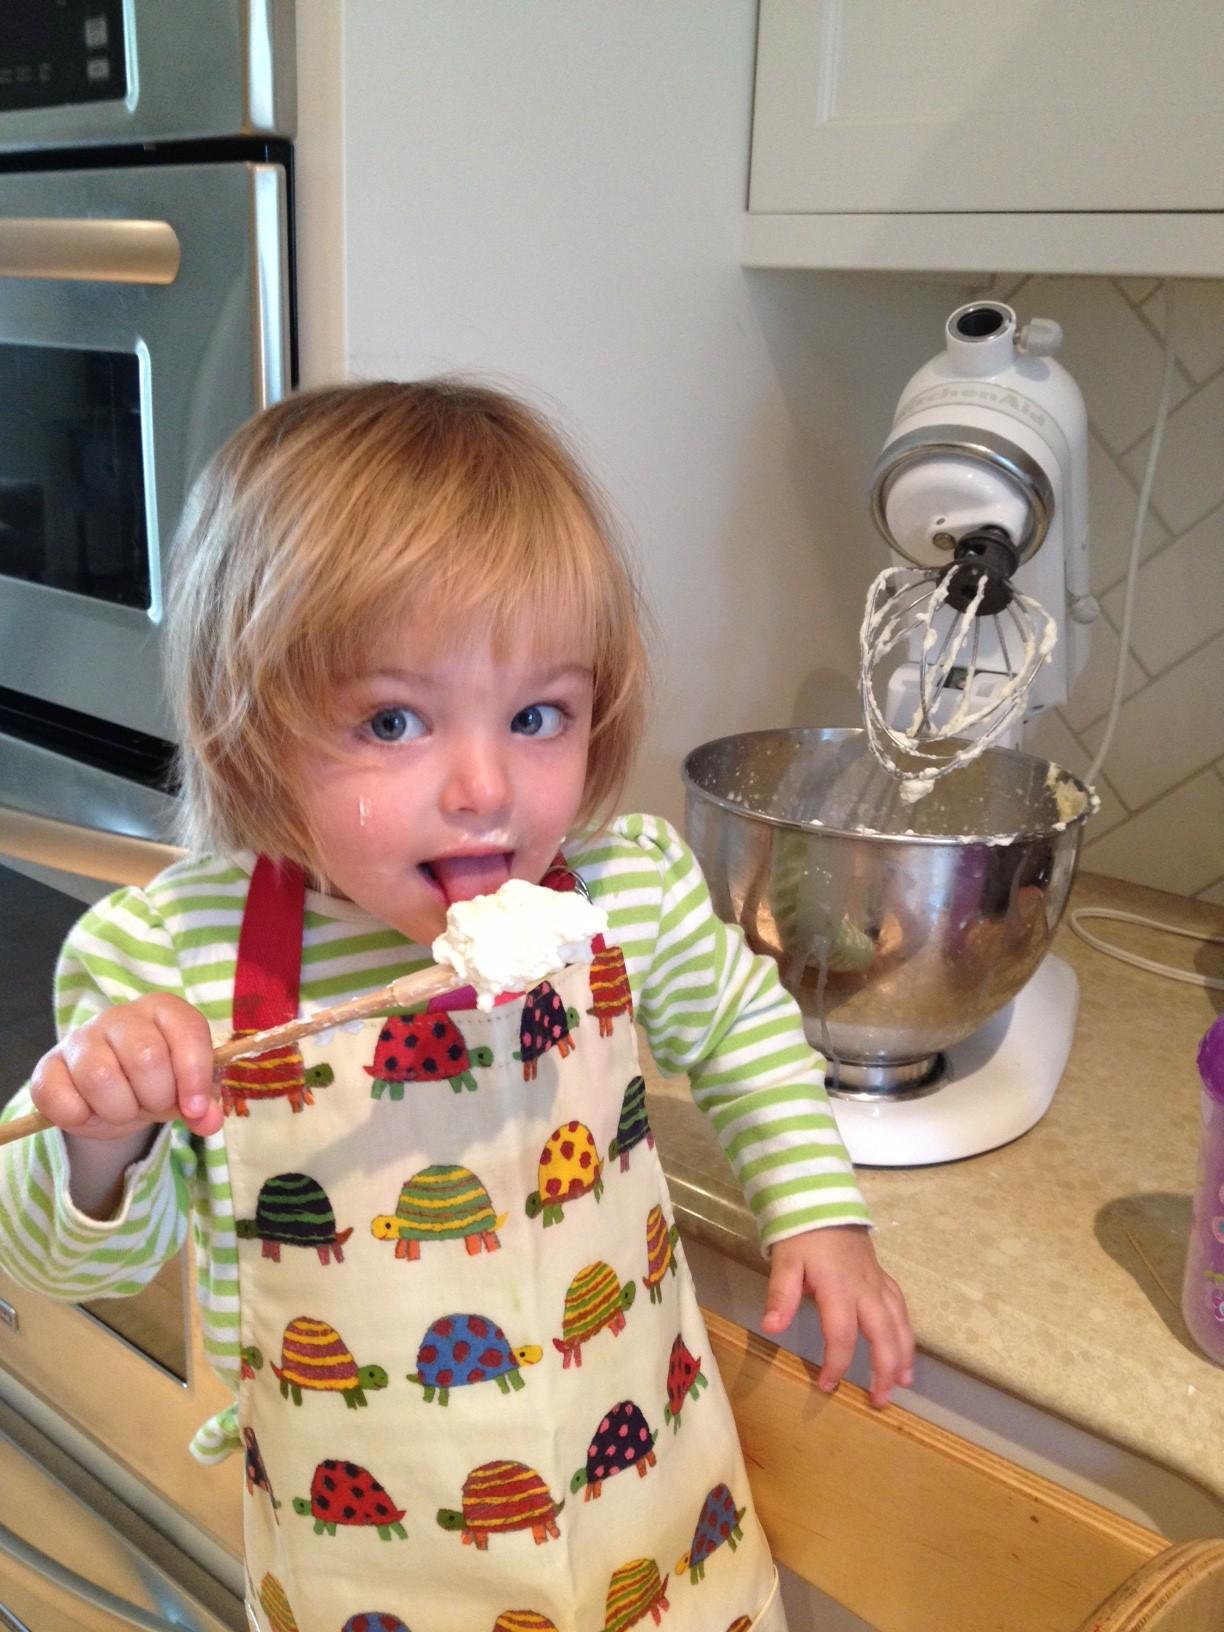 Juliana making cupcakes Sept 2013.JPG